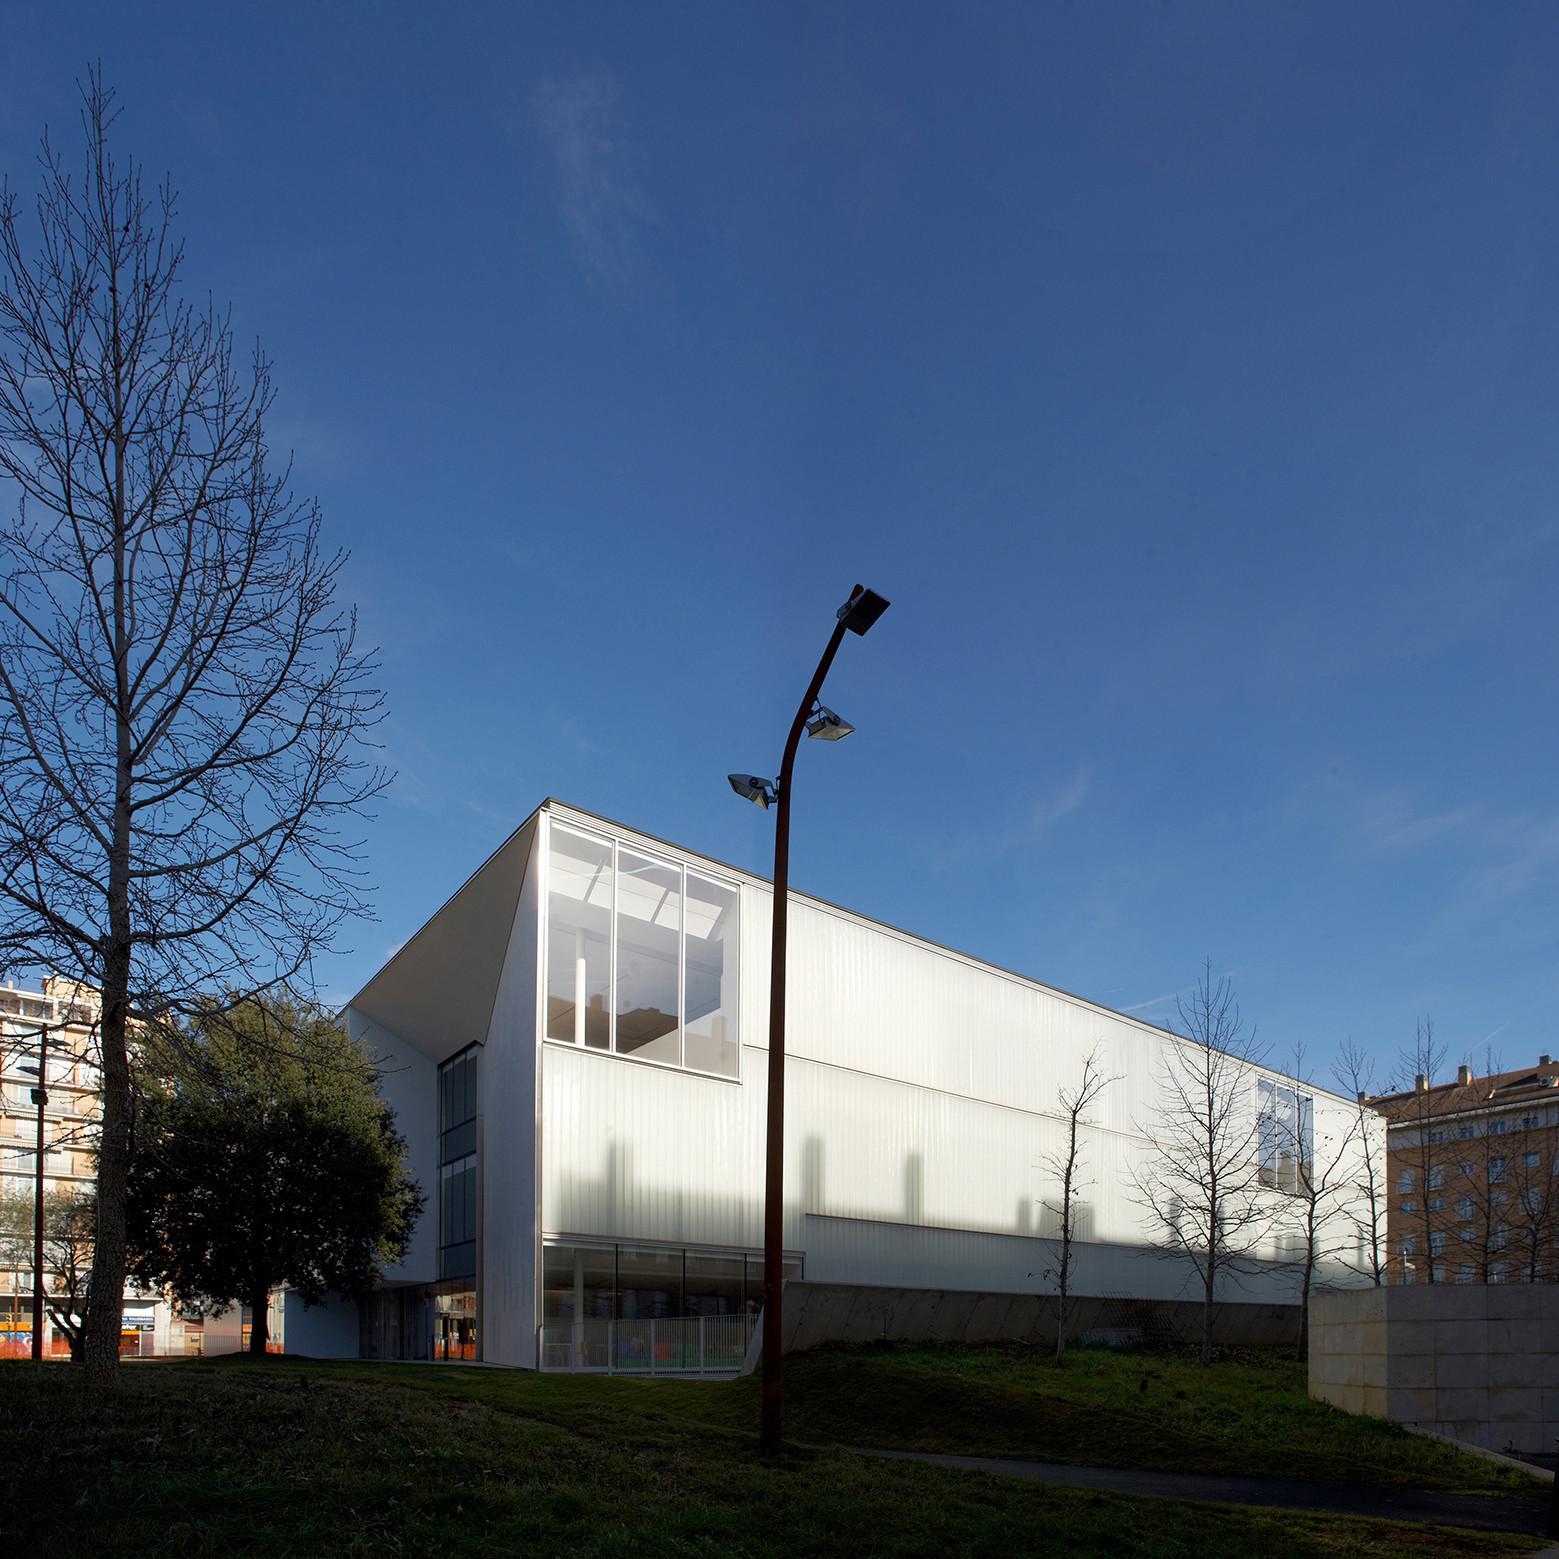 Gallery of girona public library corea moran arquitectura 8 - Arquitectura girona ...